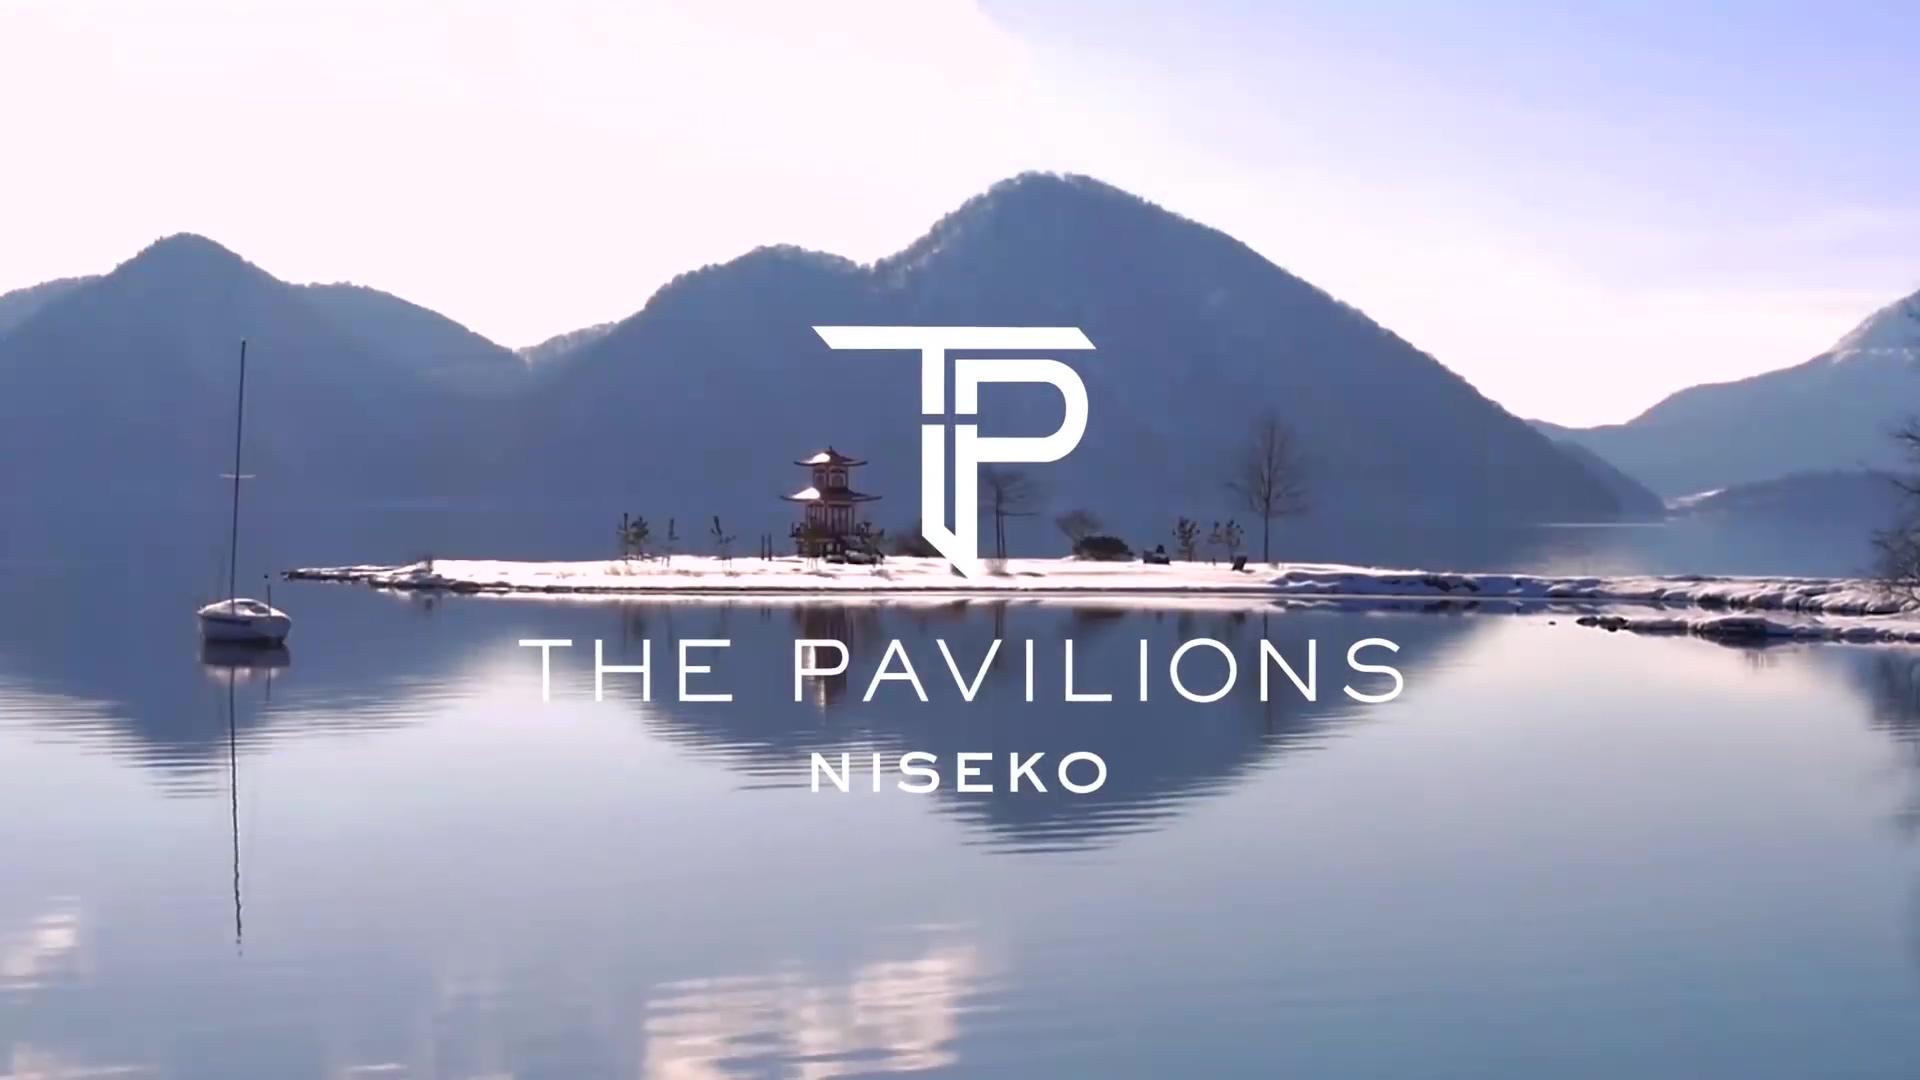 The Pavilions Niseko - Luxury Private Villa